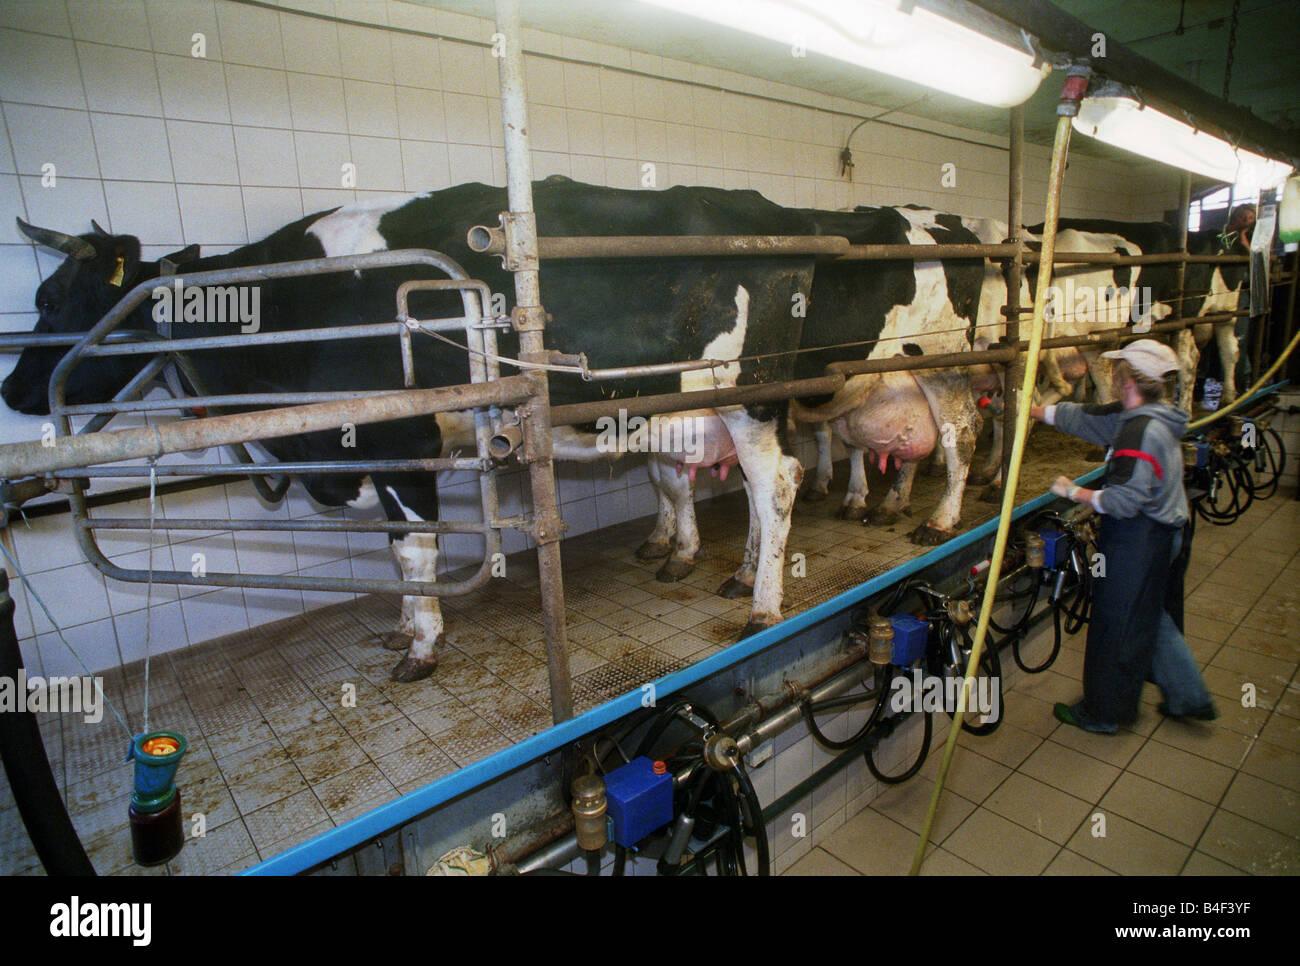 Milking Cow Milking Plant Fotos Milking Cow Milking Plant Imagens  -> Planta De Sala De Ordenha